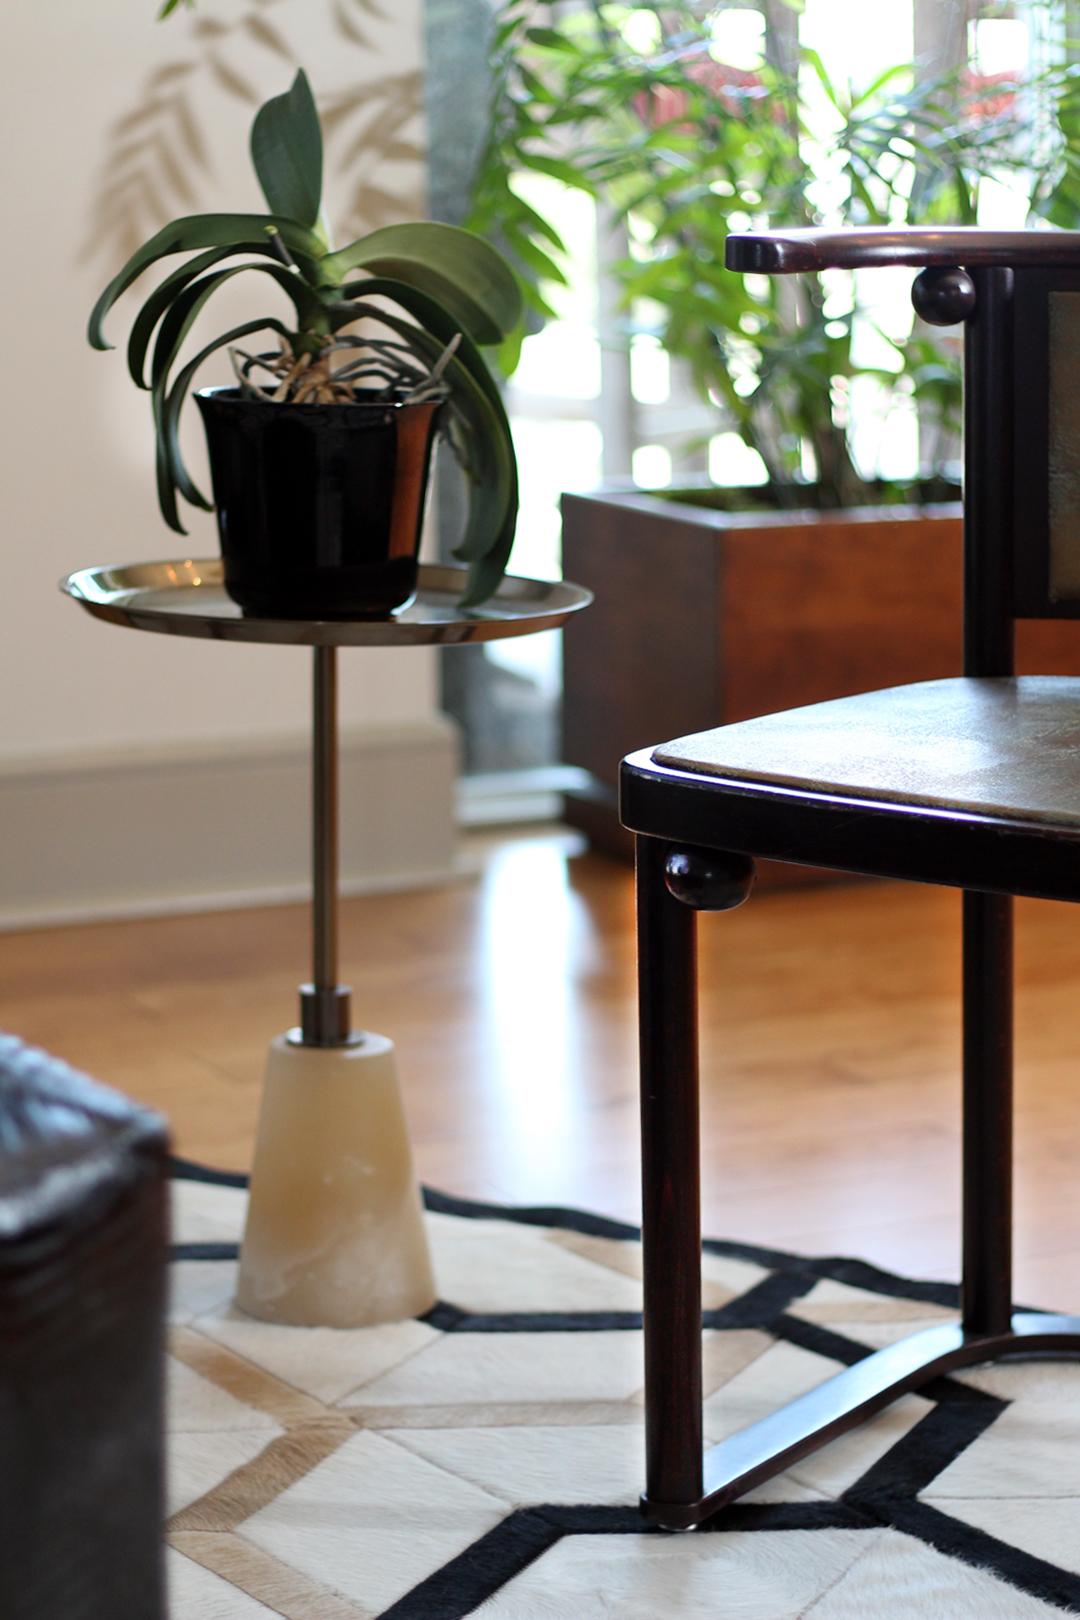 Classic Furniture Josef Hoffman Cabaret Fledermaus Chair